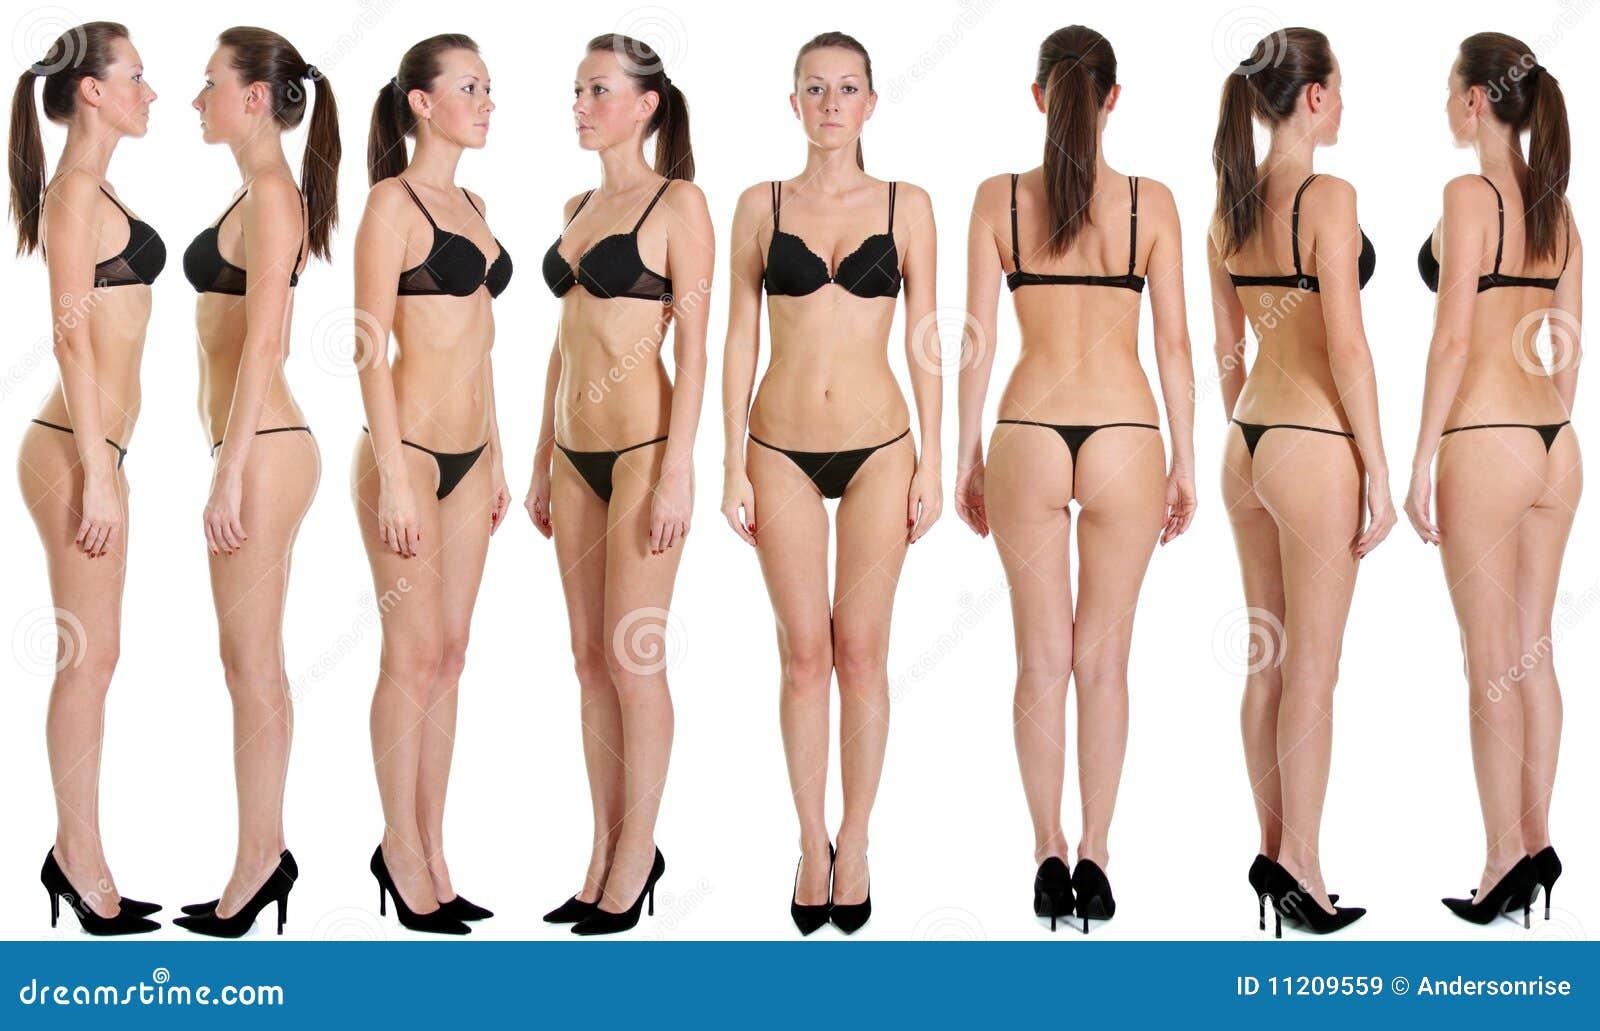 Bikini model karli